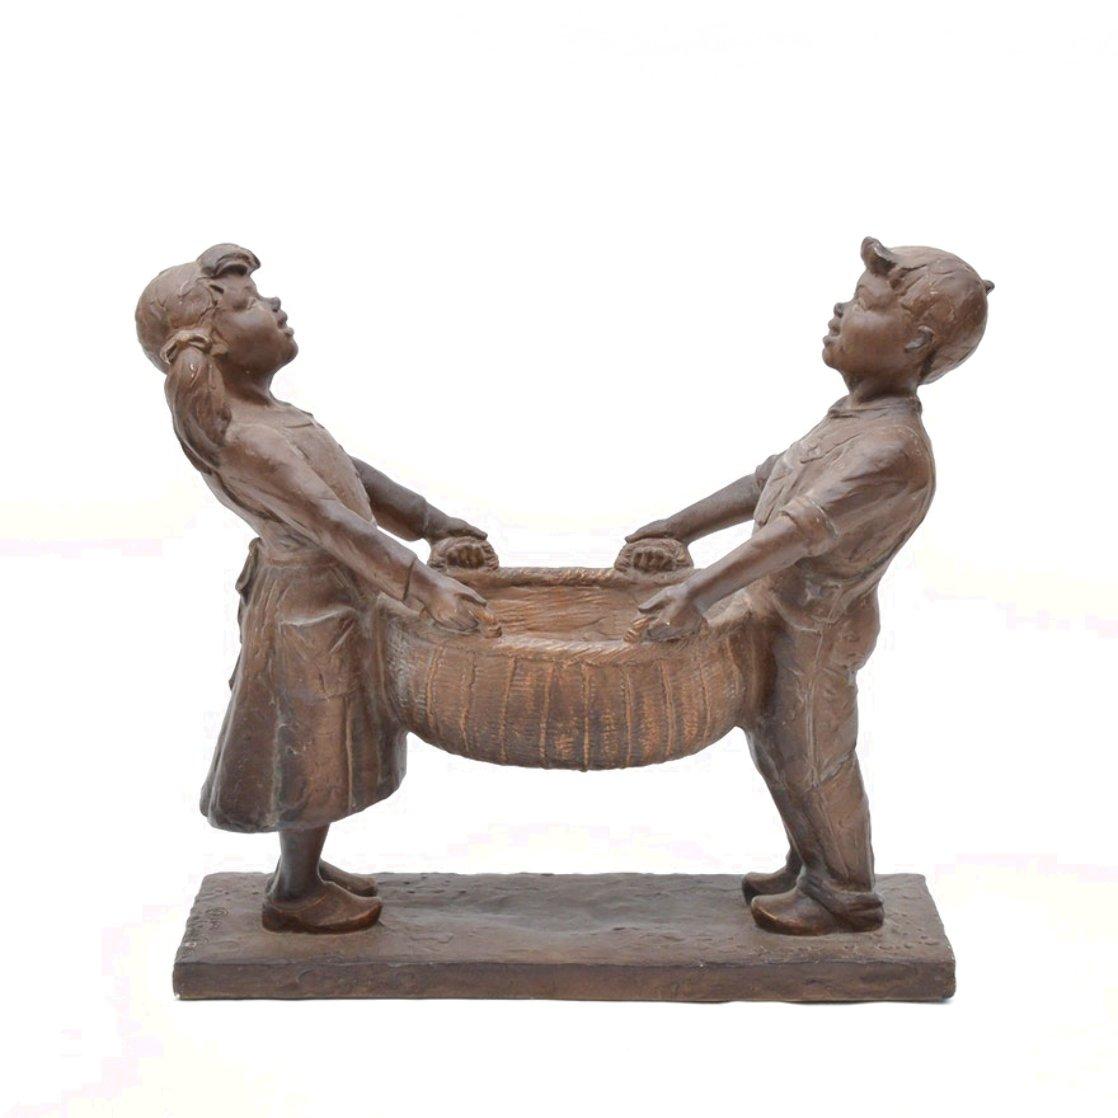 Harvest Joy Kids Bronze Sculpture 2001 26 in Sculpture by Gary Lee Price